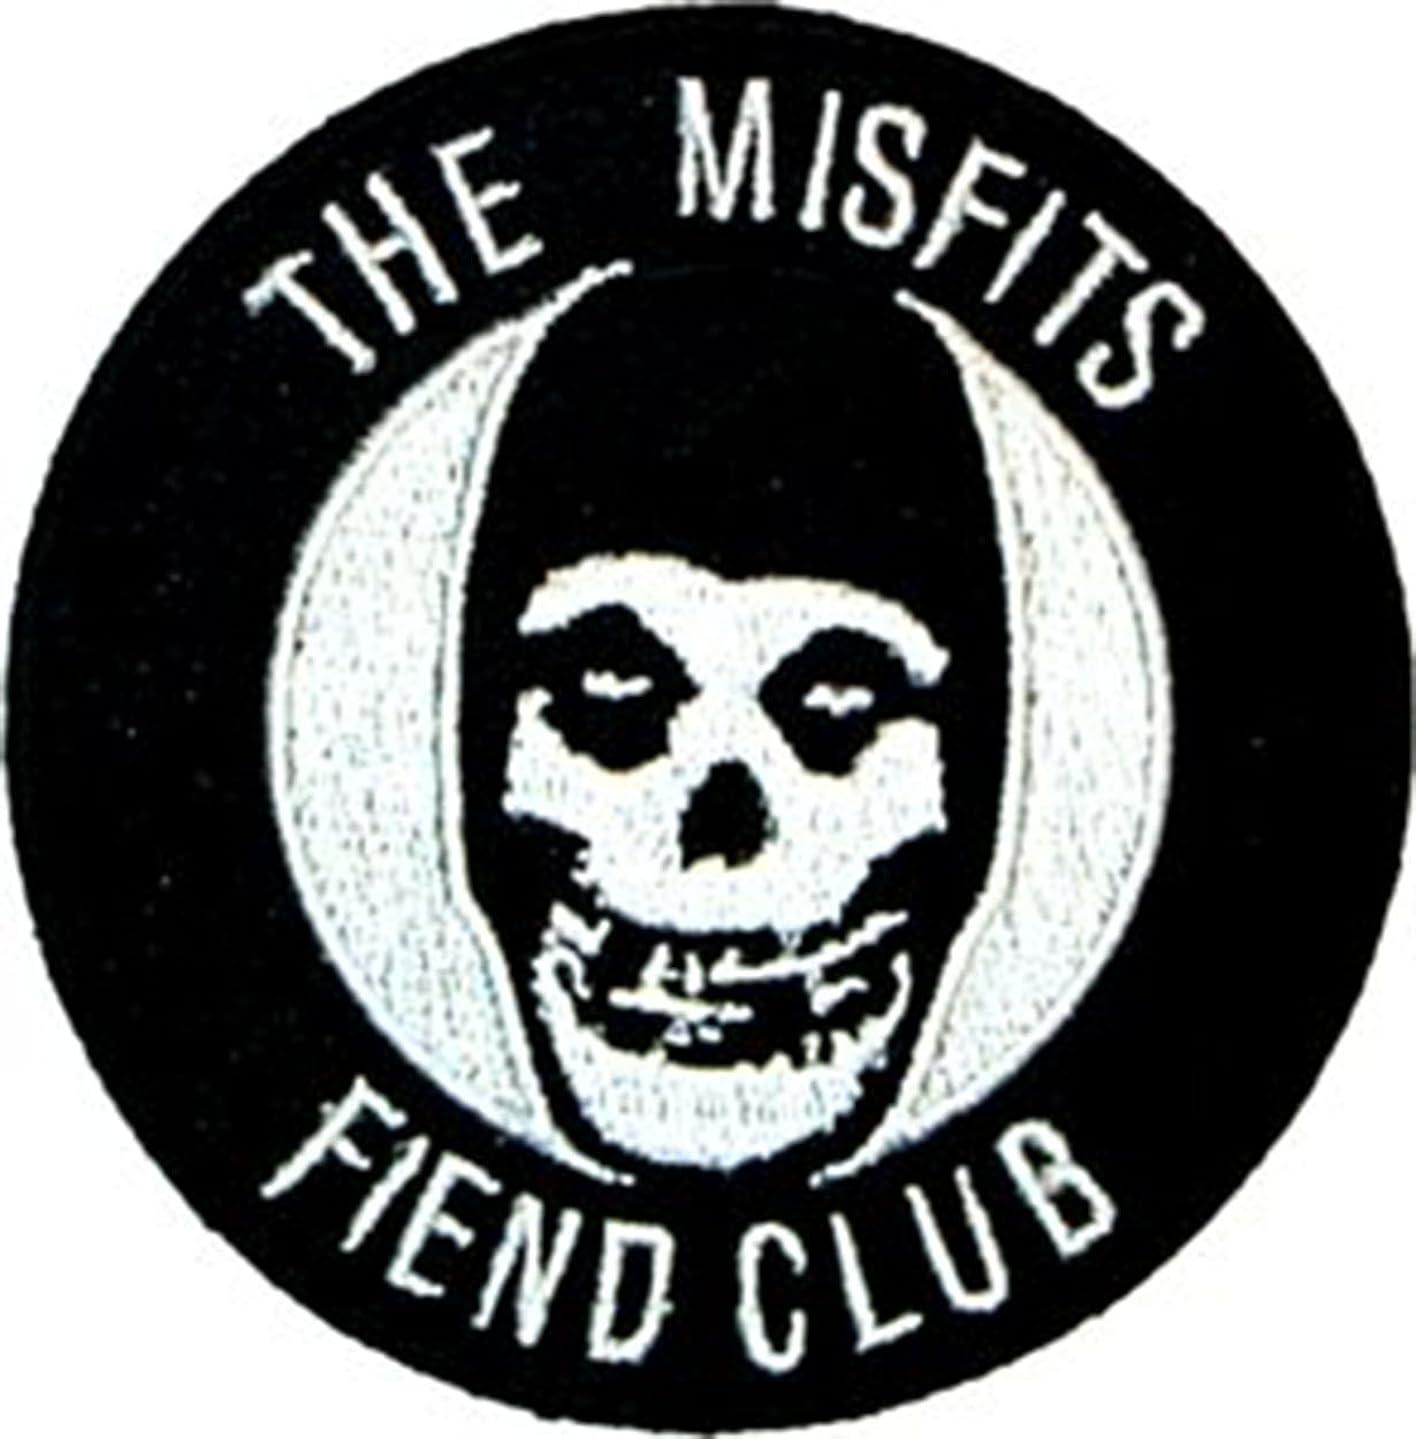 Application Misfits Fiendclub Patch xoesw61179447614